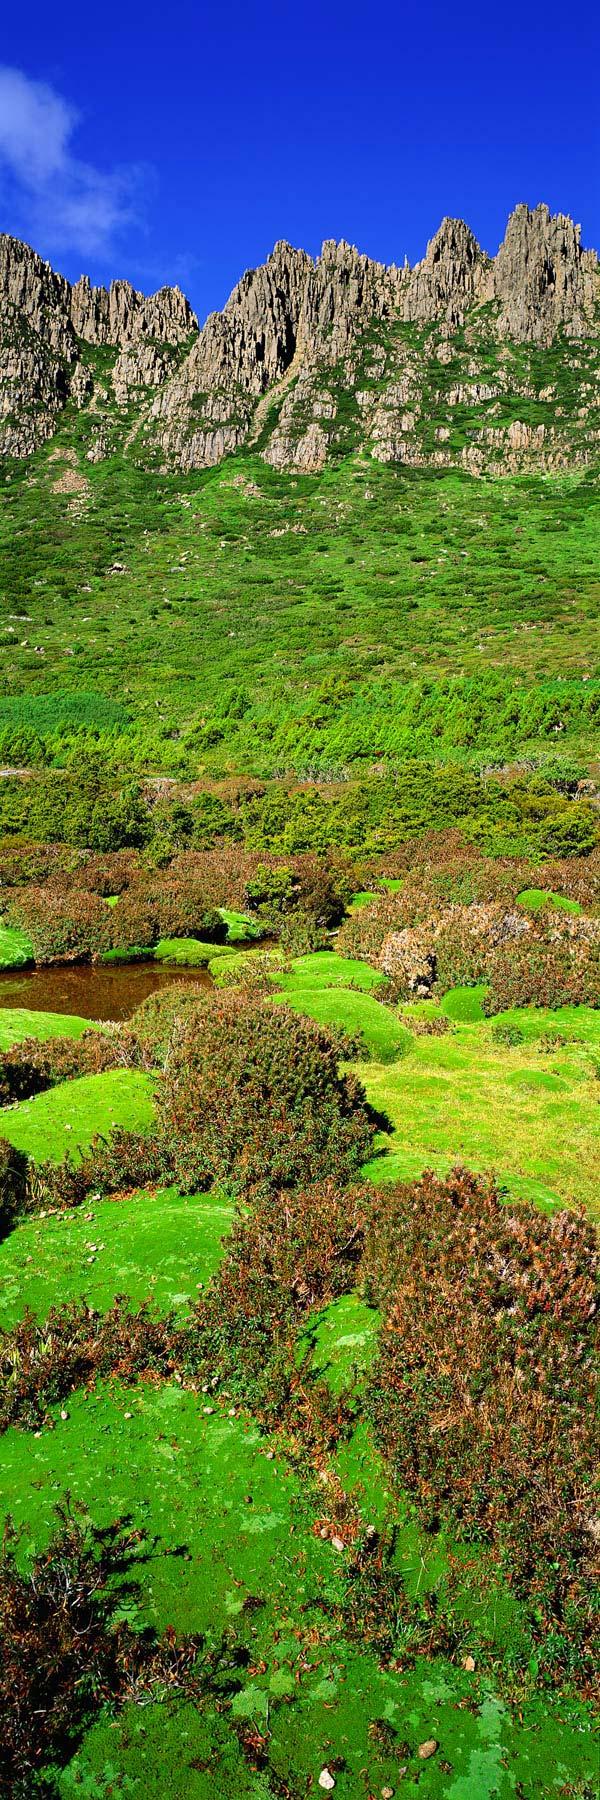 Alpine shrubs and moss below the peaks of Cradle Mountain, Tasmania.